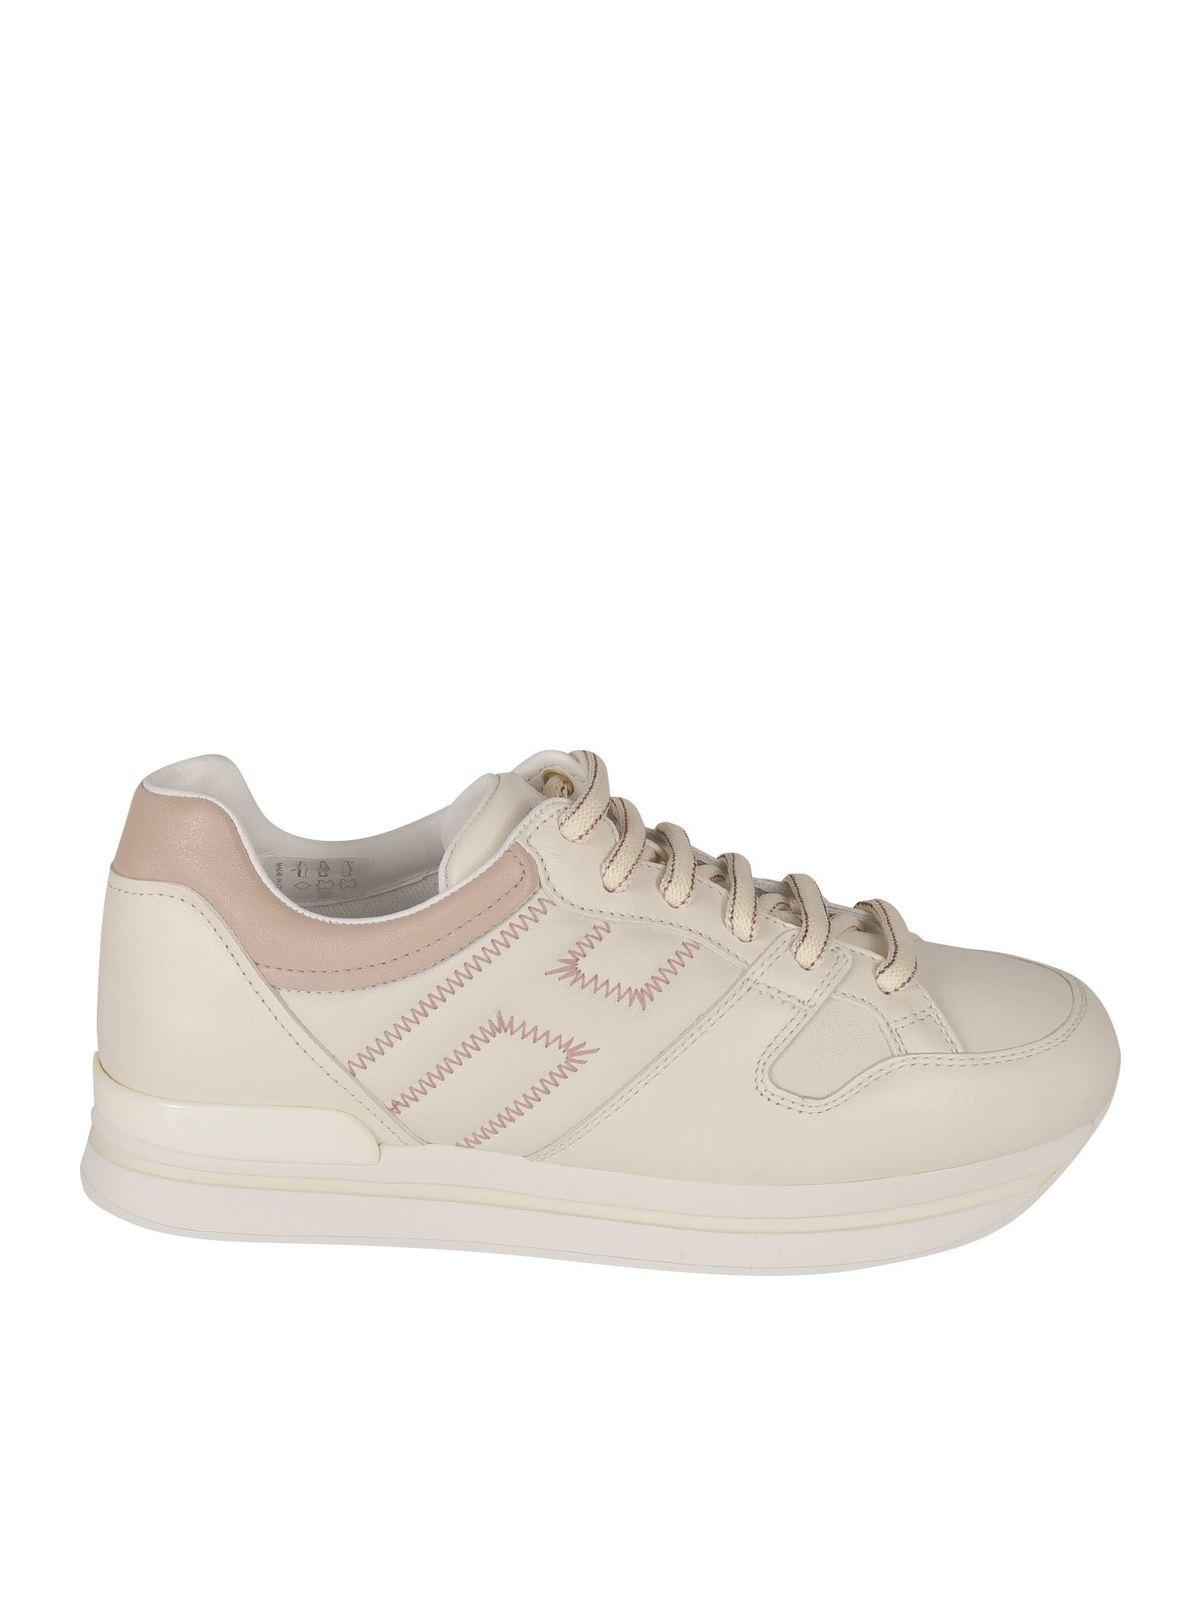 Hogan H222 Sneakers In Beige And Pink